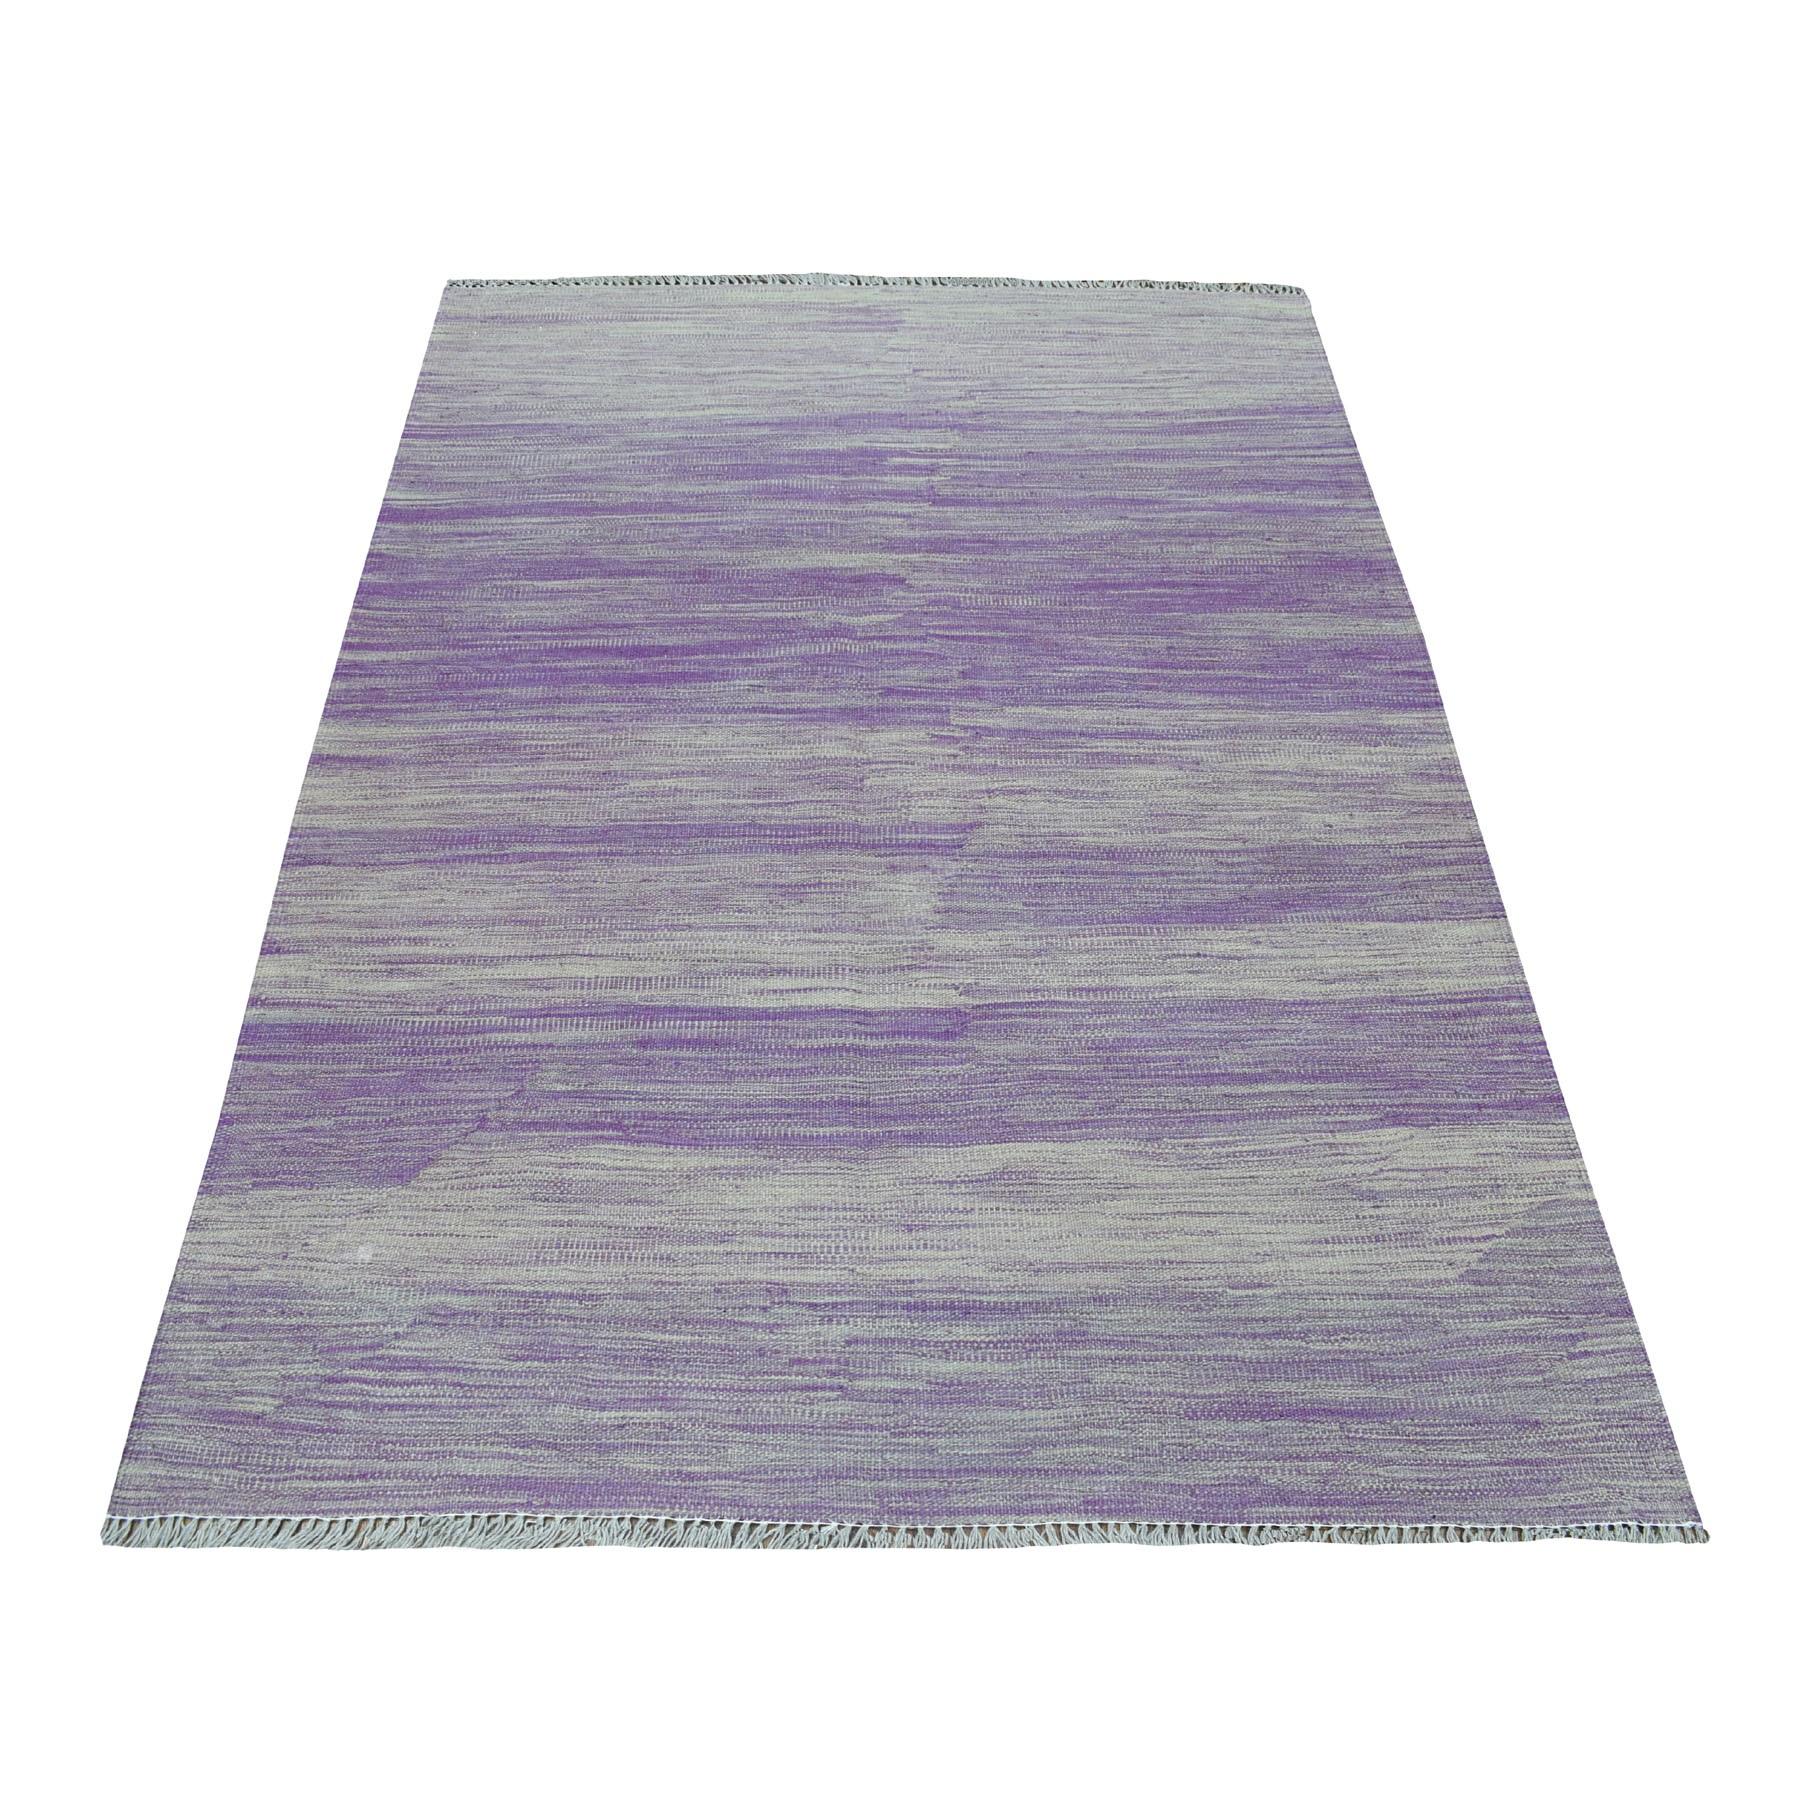 "4'X5'10"" Lavender Shades Flat Weave Kilim Pure Wool Hand Woven Oriental Rug moaedbca"